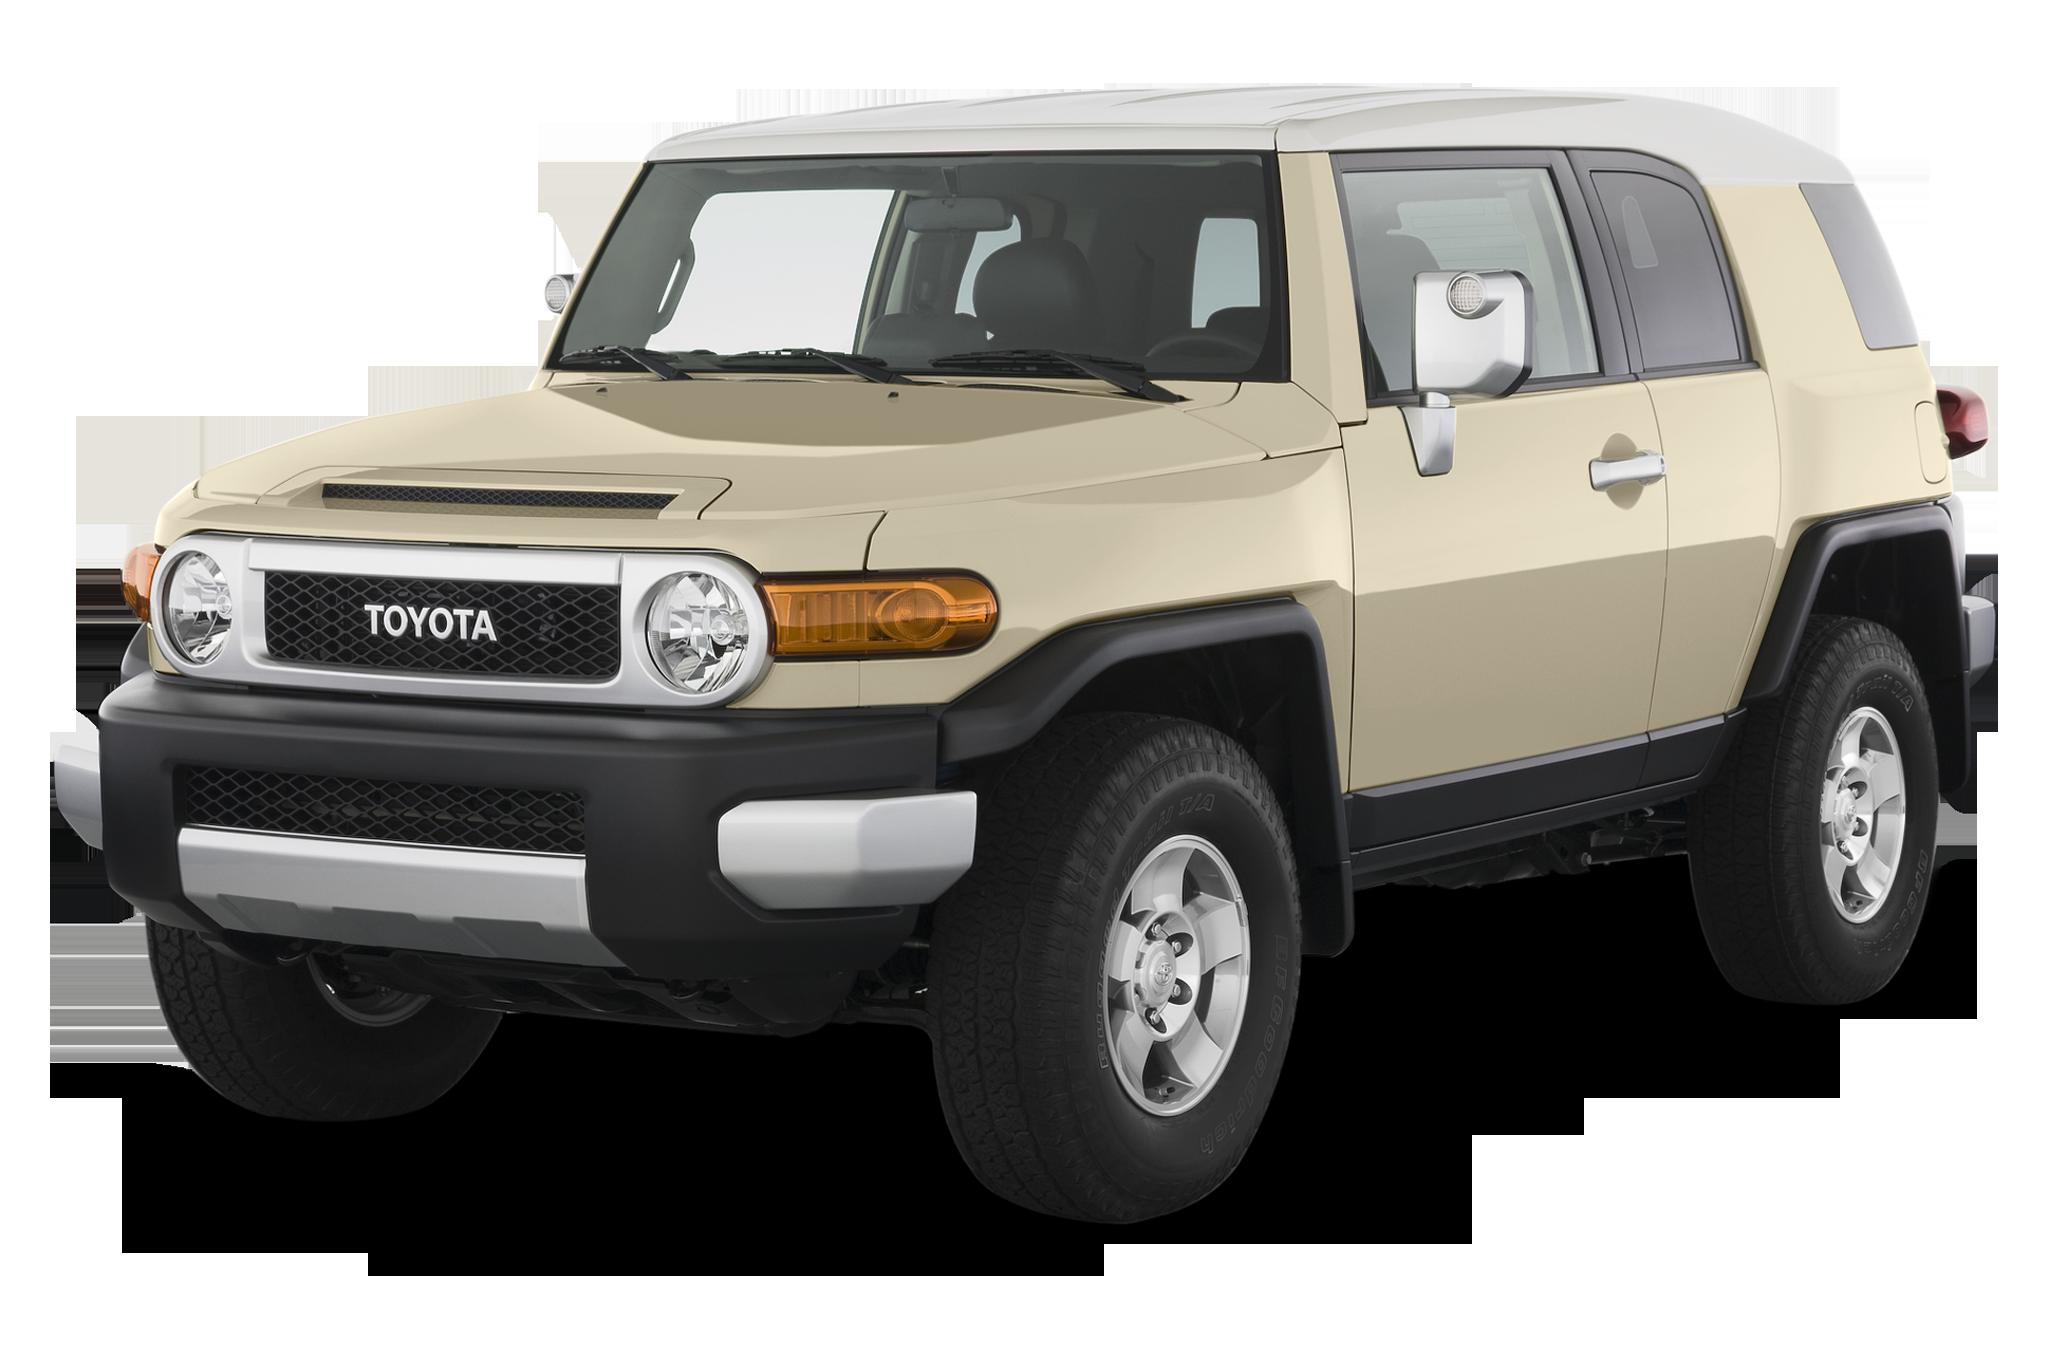 2010 Toyota Fj Cruiser Midsize Suv Review Automobile Magazine Mega